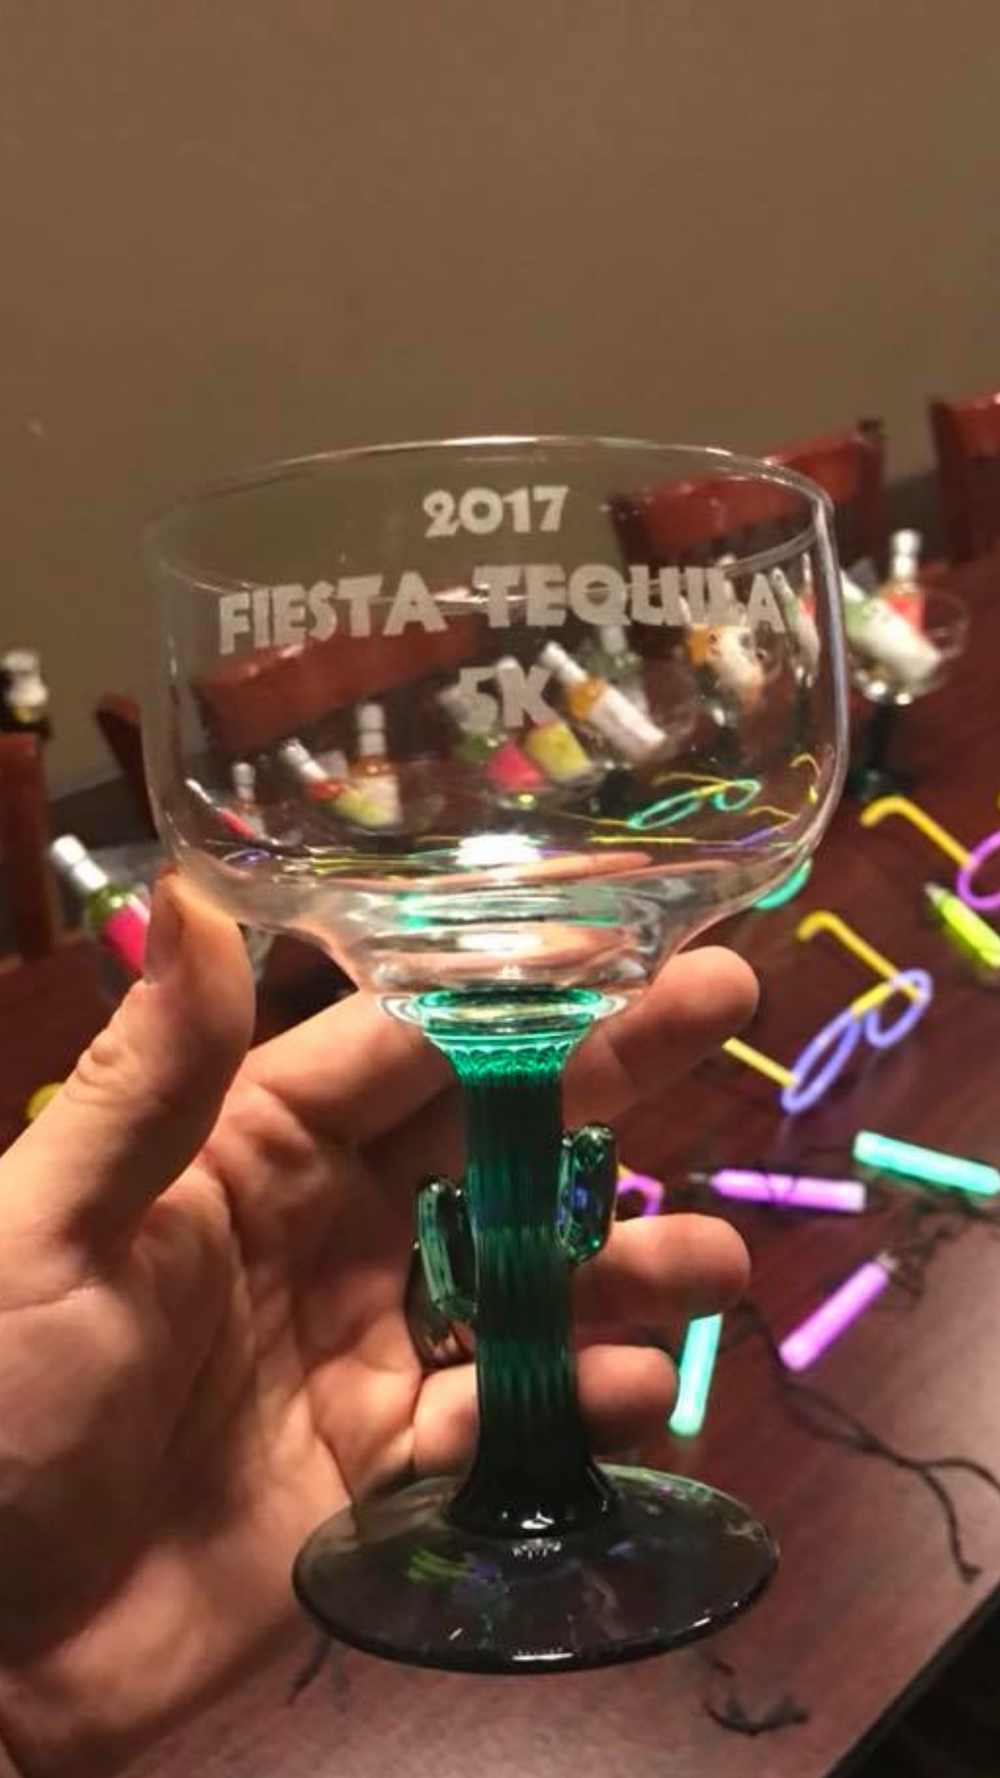 fiesta tequila 5k.png